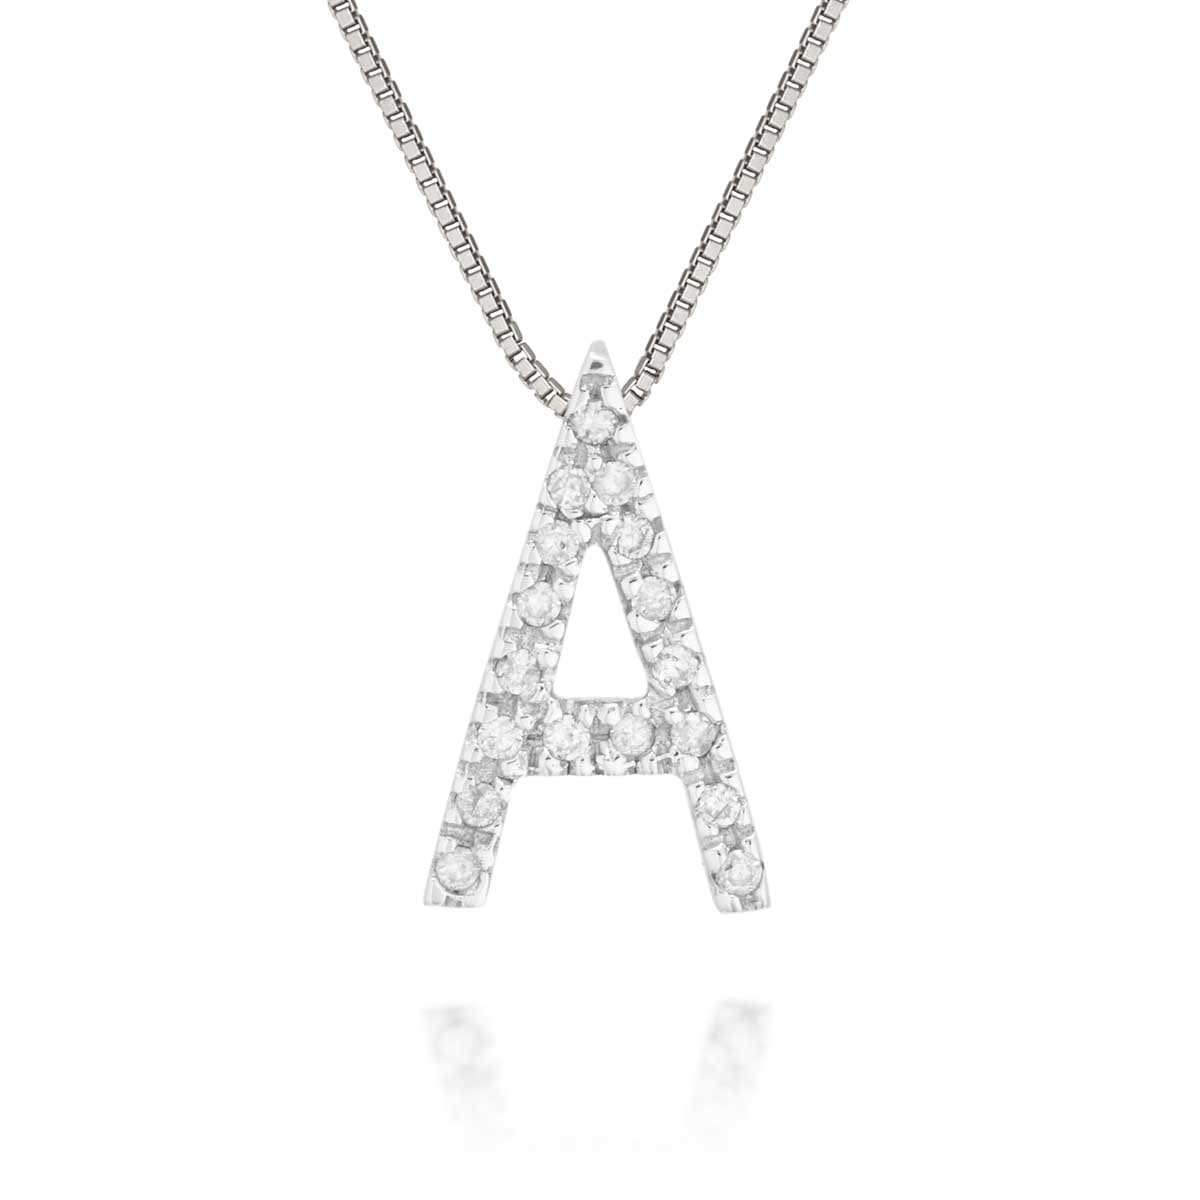 Pingente Letra A Ouro Branco e Diamantes - Colecao Stick Letra 7a78461316